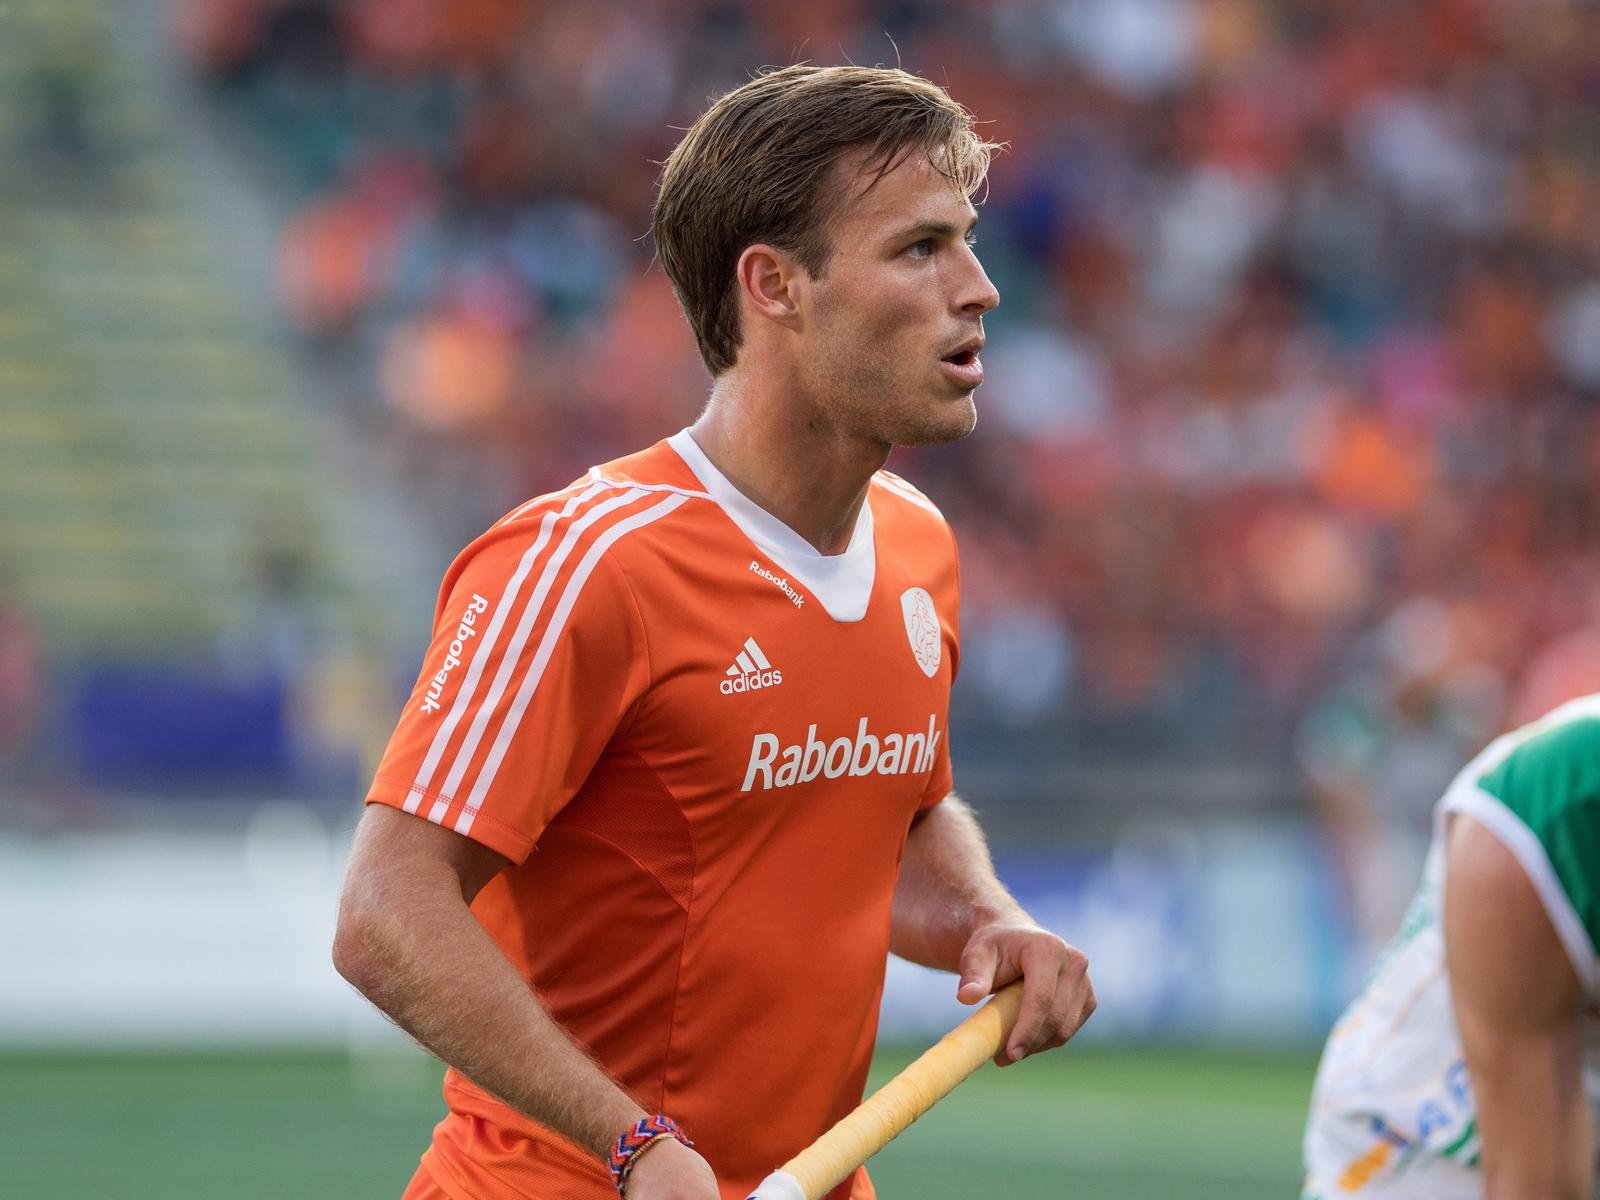 Oranje nederland heren WK RU Hertzberger